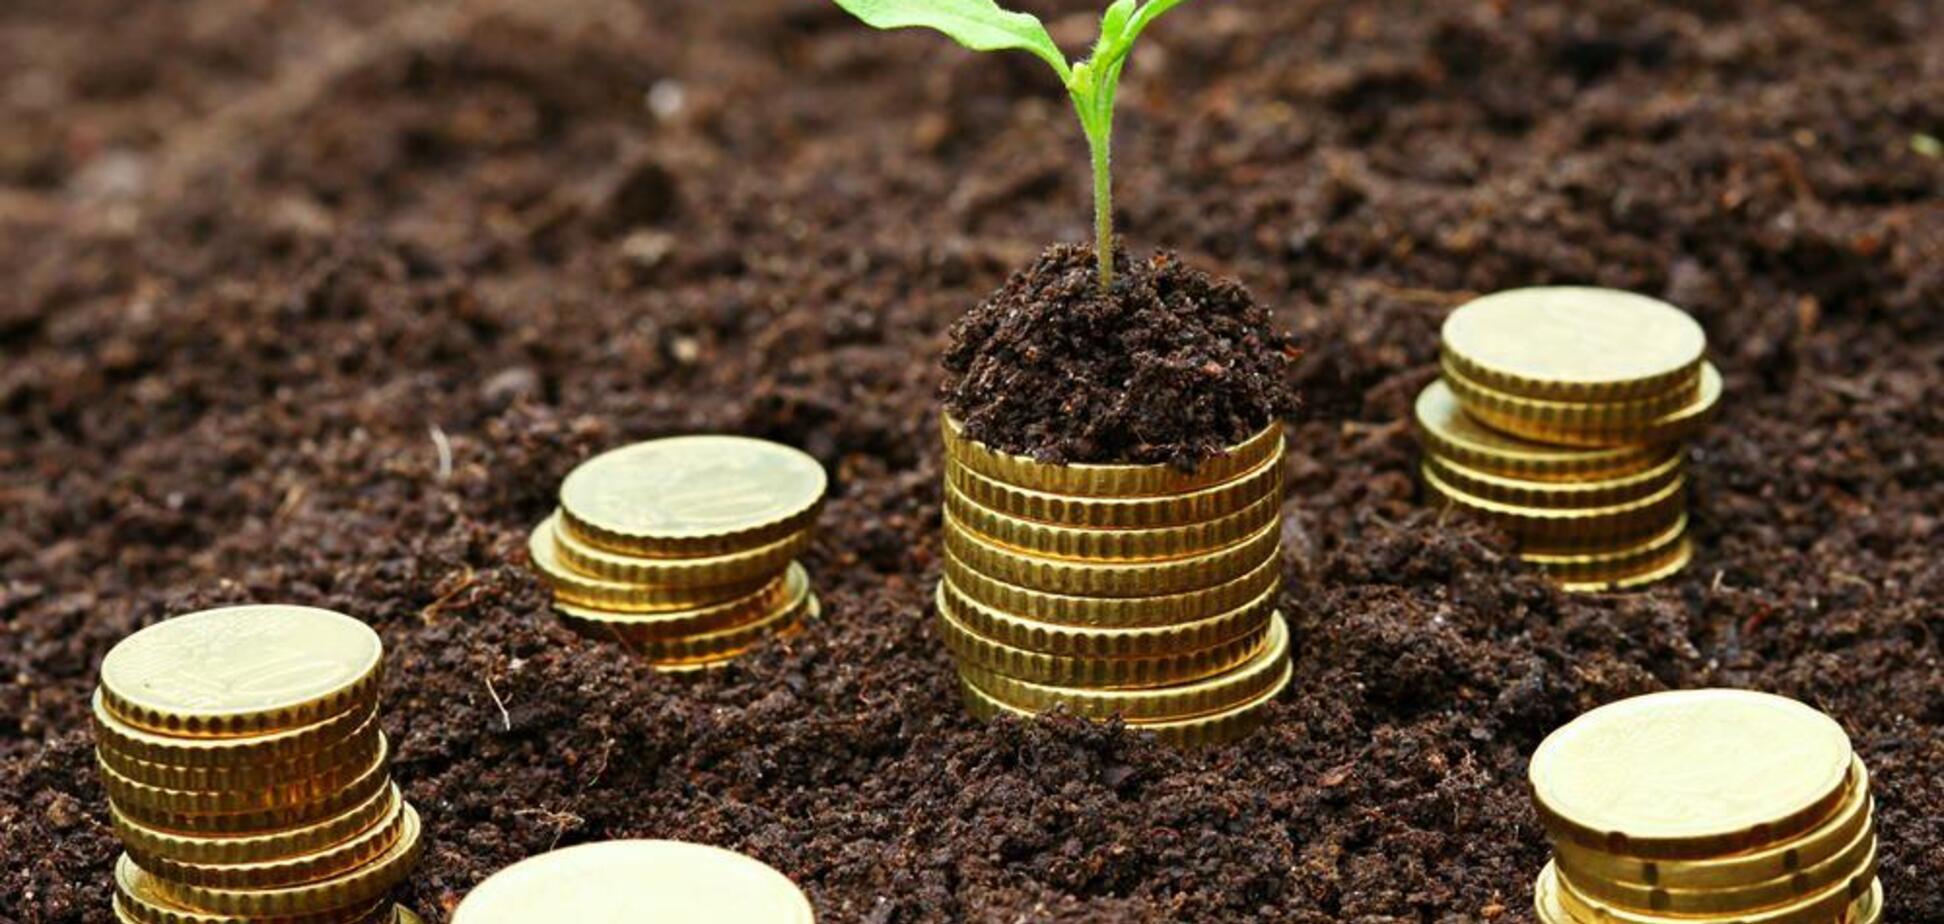 Як ростиме економіка України: озвучено прогноз на найближчі роки